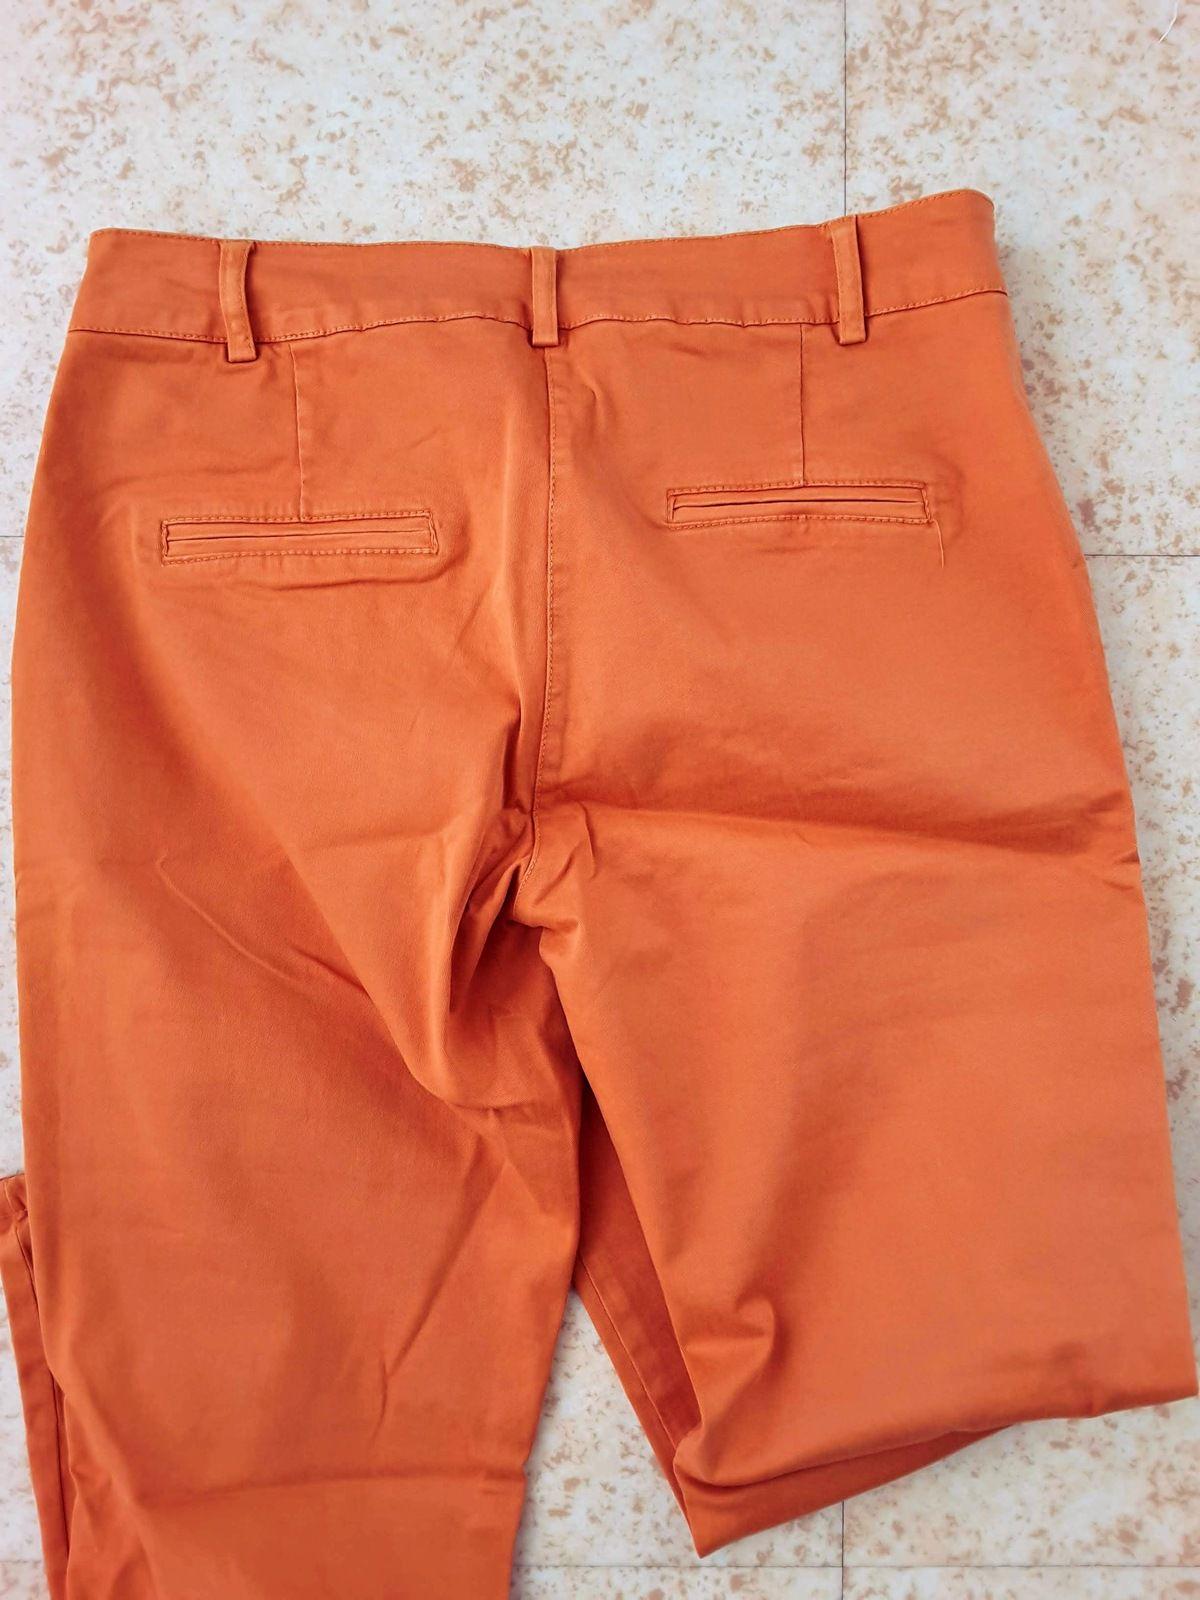 pantalon Arabia Pant Olive orange - L'olive verte lookiero missbonsplansdunet box vêtements styliste personal shopper